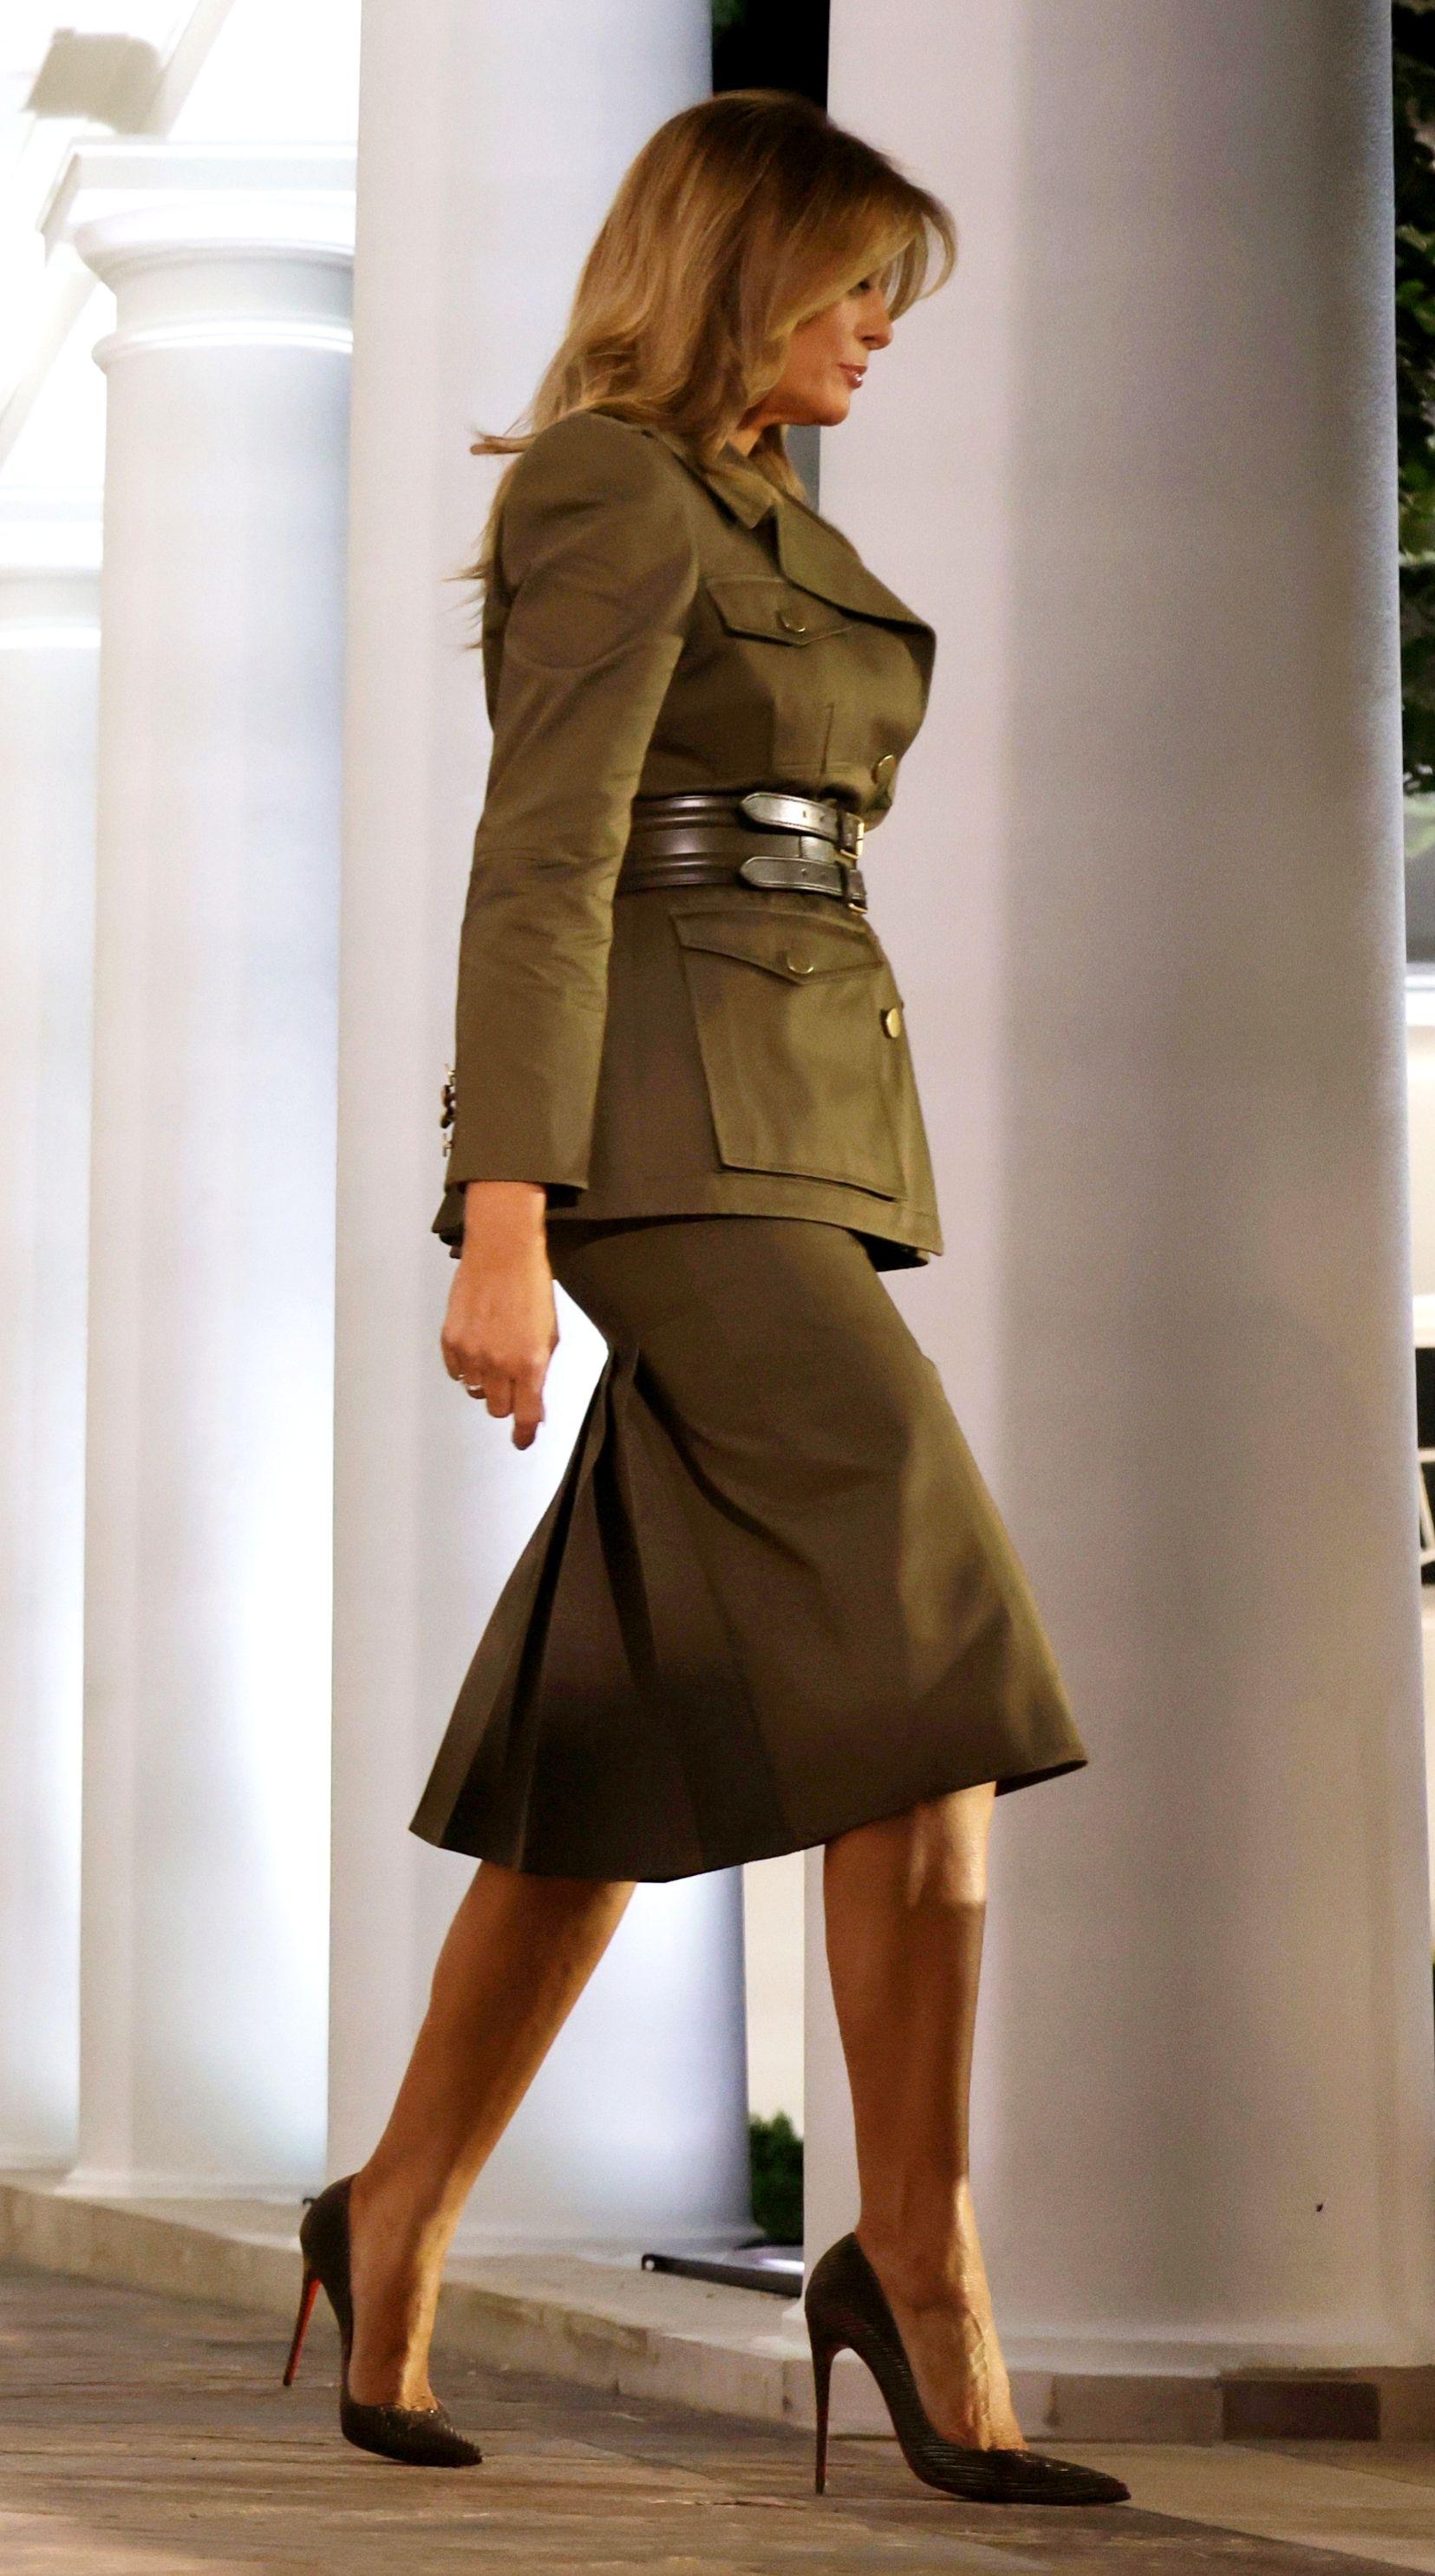 FLOTUS Melania Trump arrives in the Rose Garden to deliver